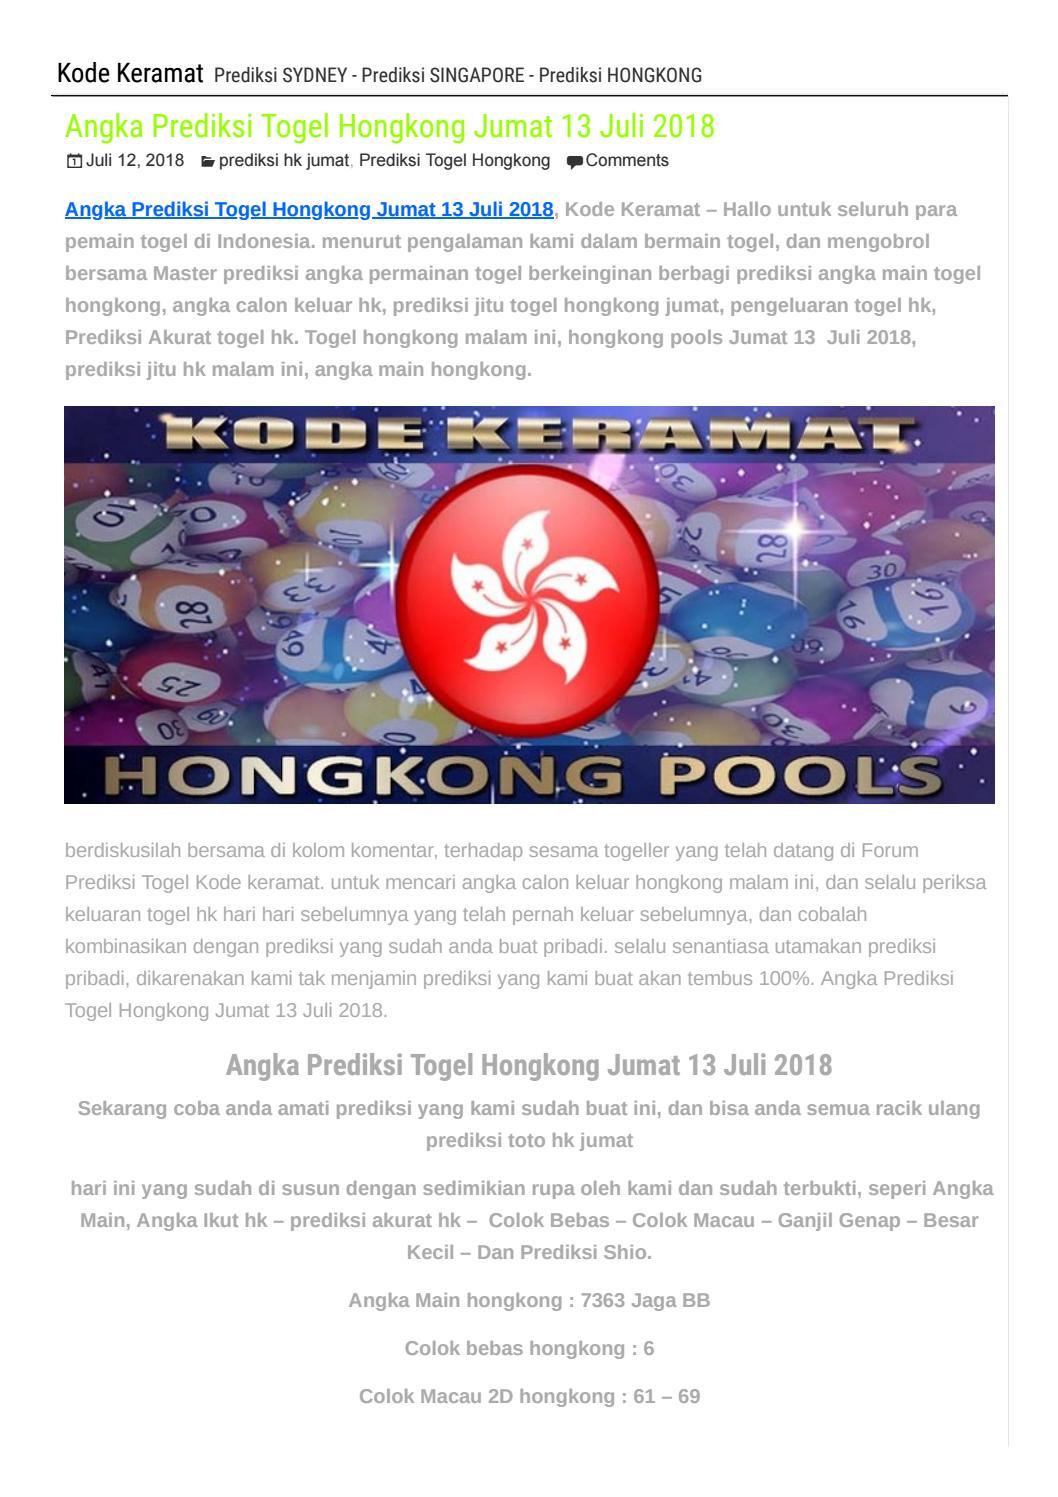 Angka Prediksi Togel Hongkong Jumat 13 Juli 2018